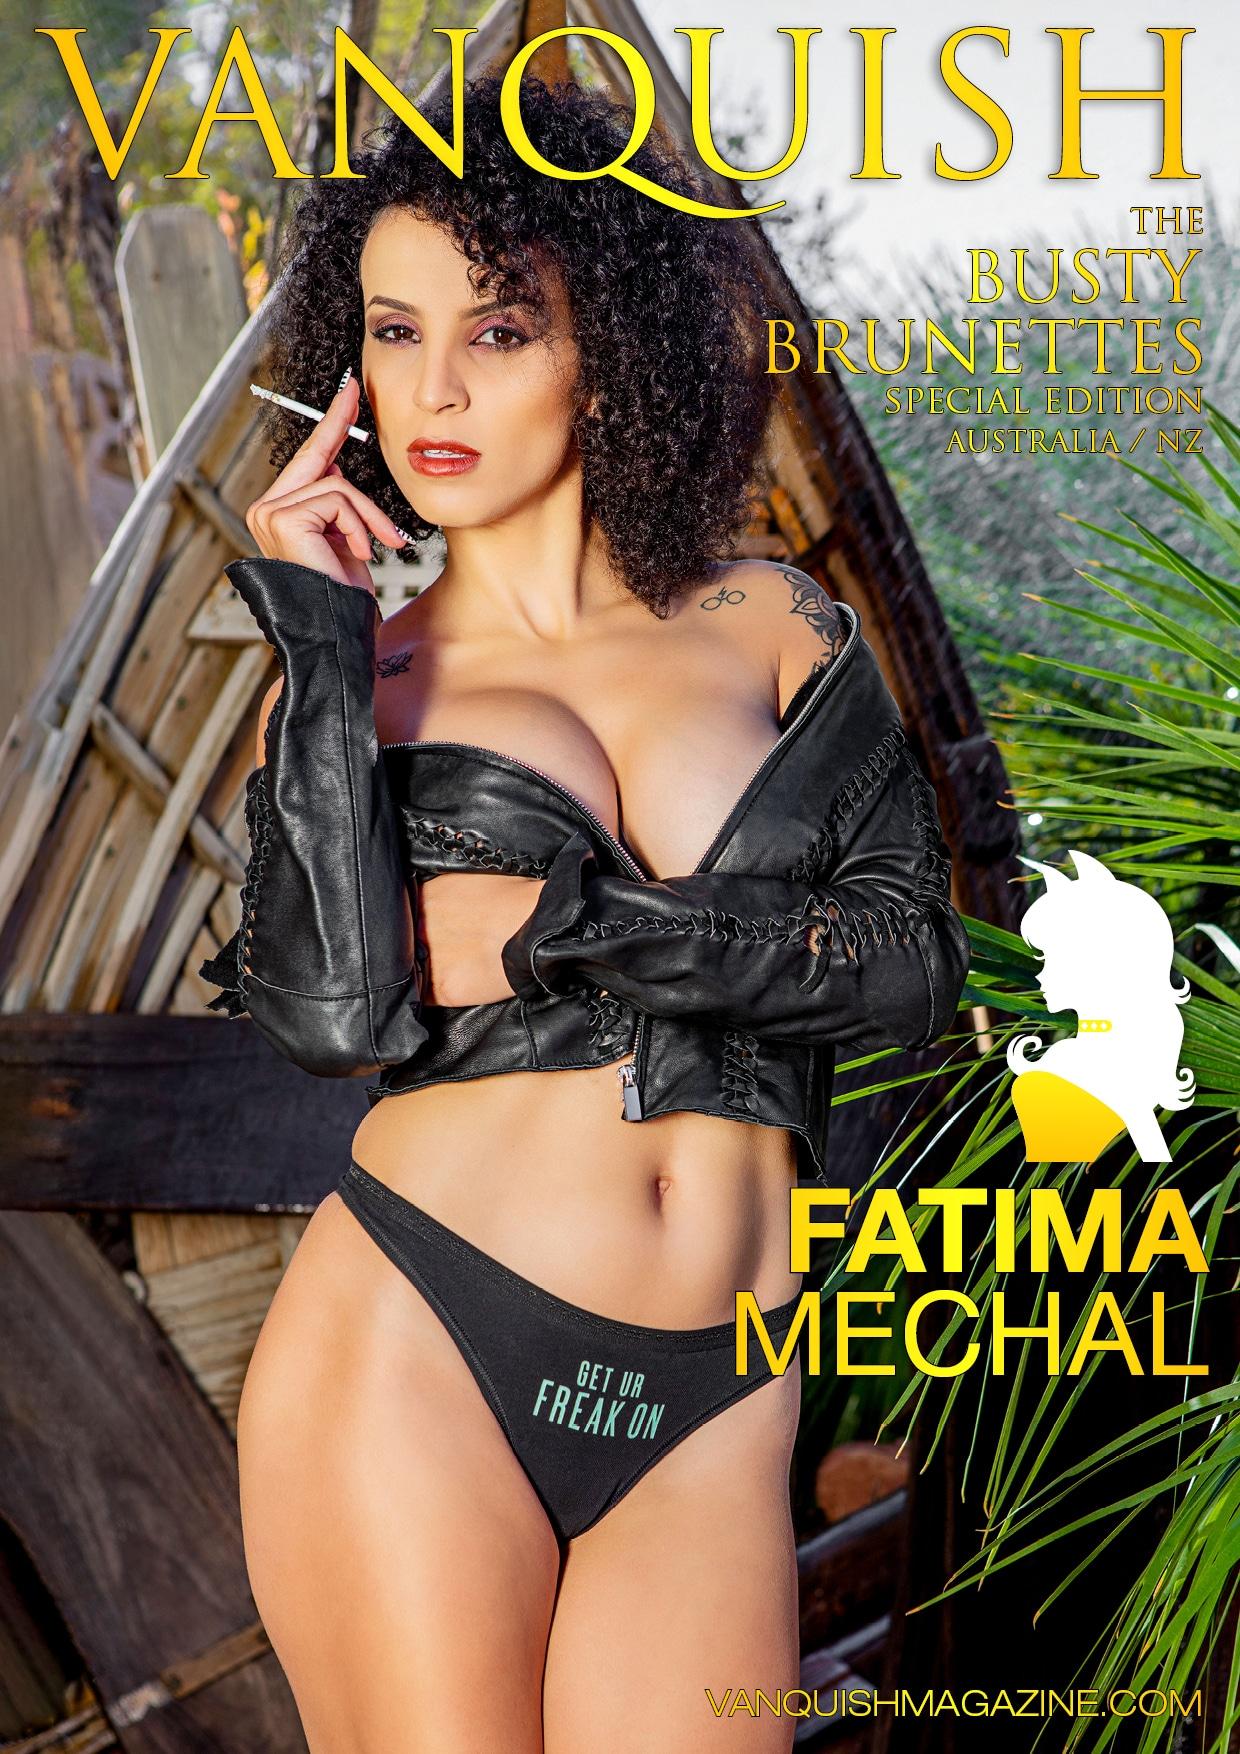 Vanquish Magazine - April 2020 - Busty Brunettes - Fatima Mechal